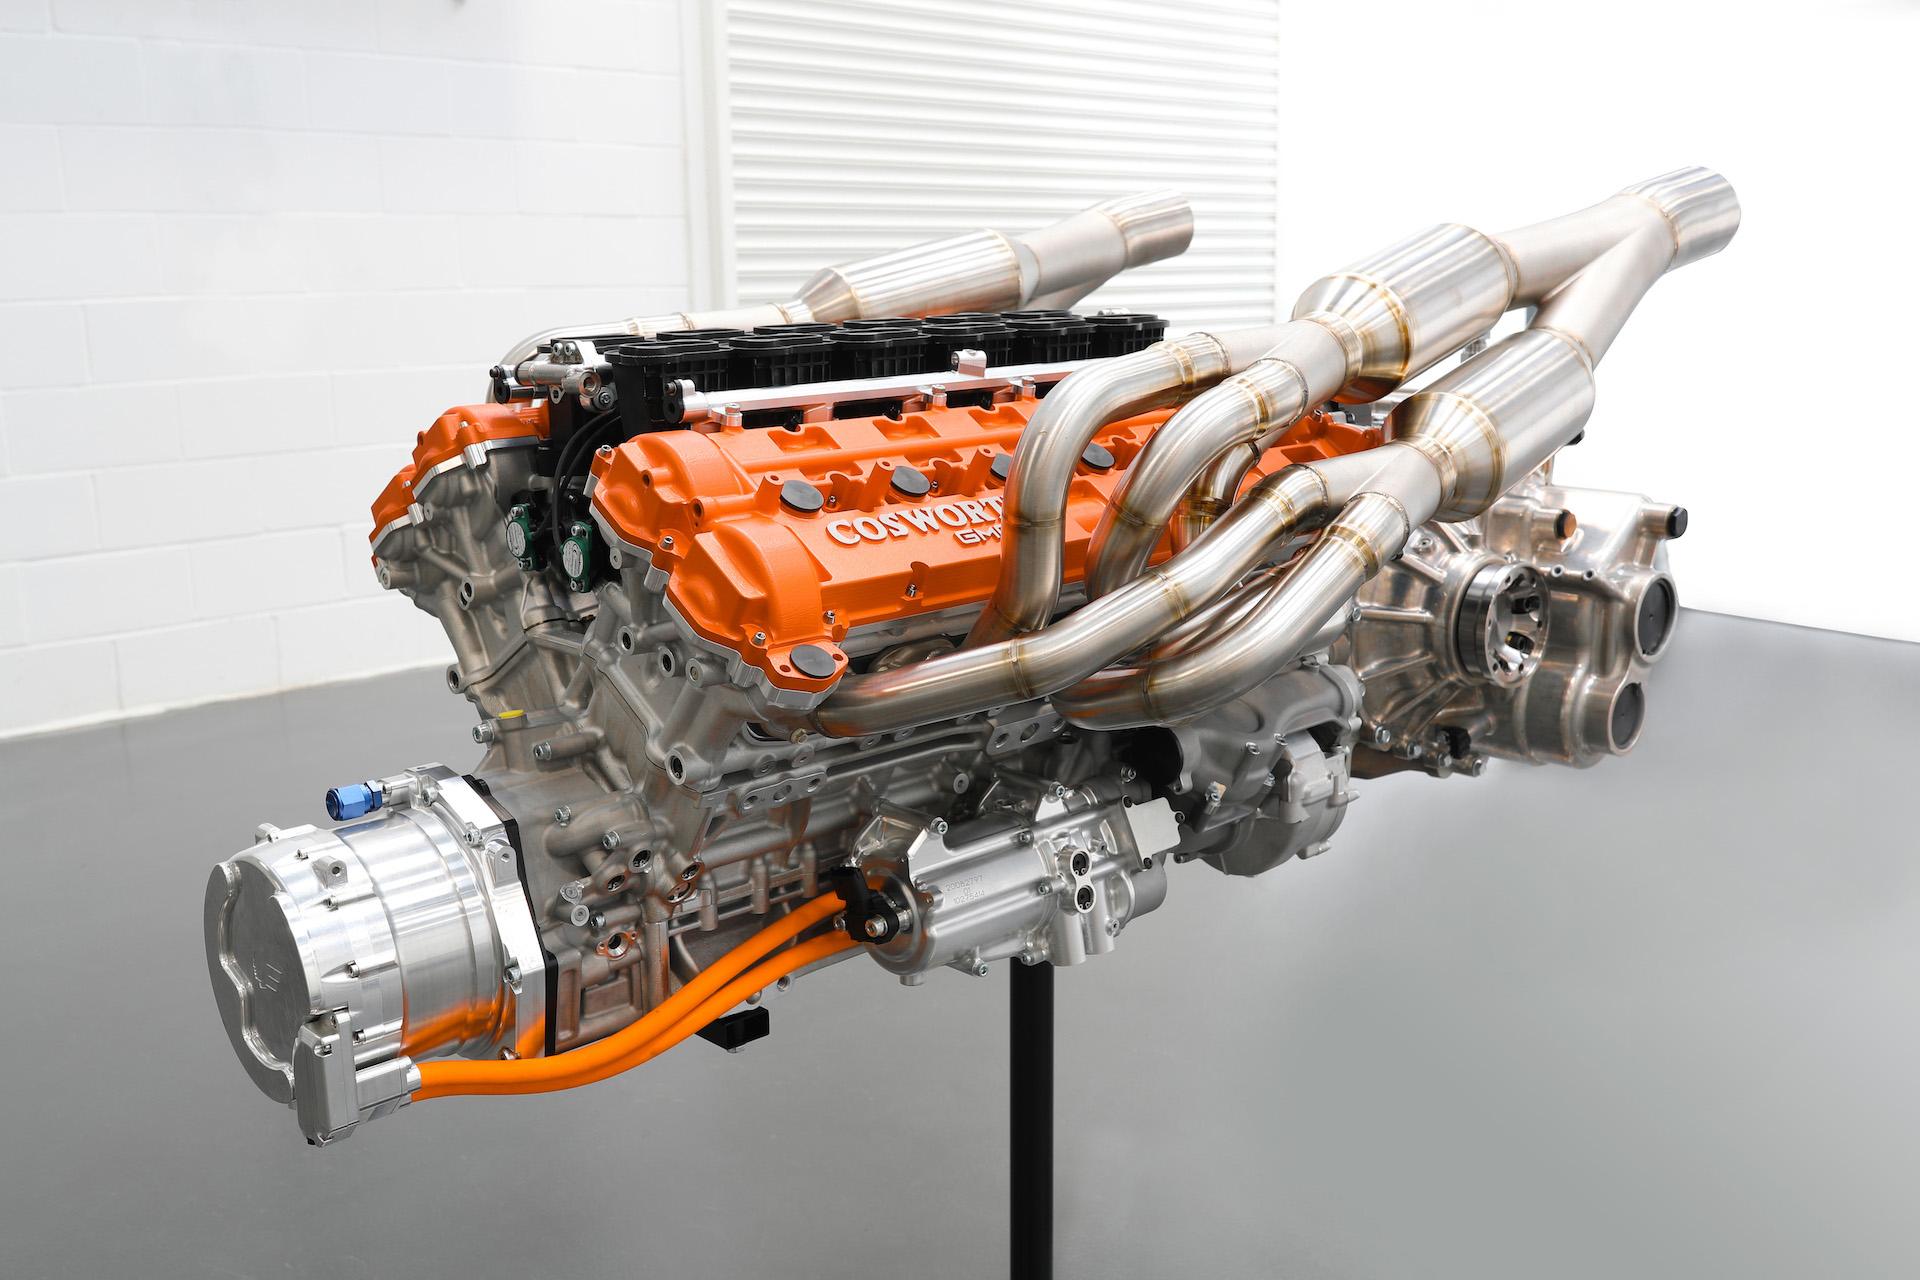 gordon-murray-automotive-t50-cosworth-v-12-engine_100755251_h